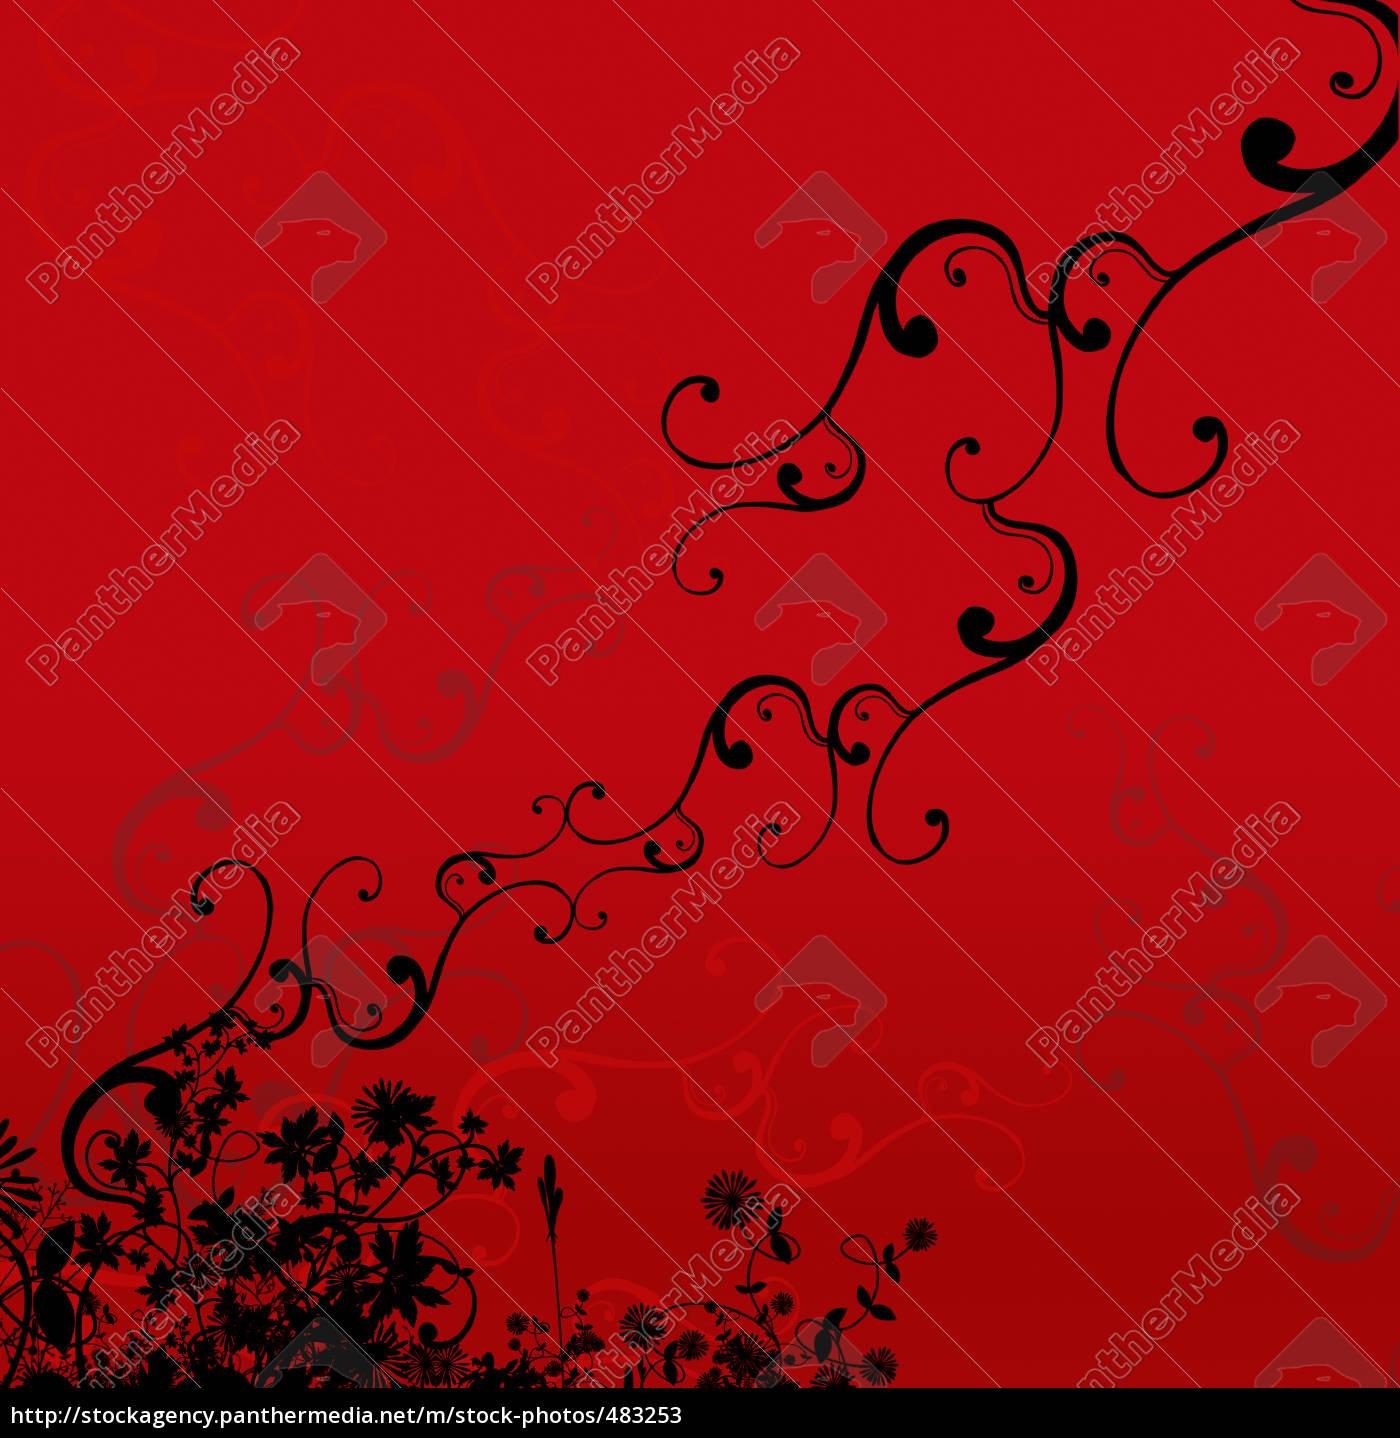 floral, ornaments - 483253